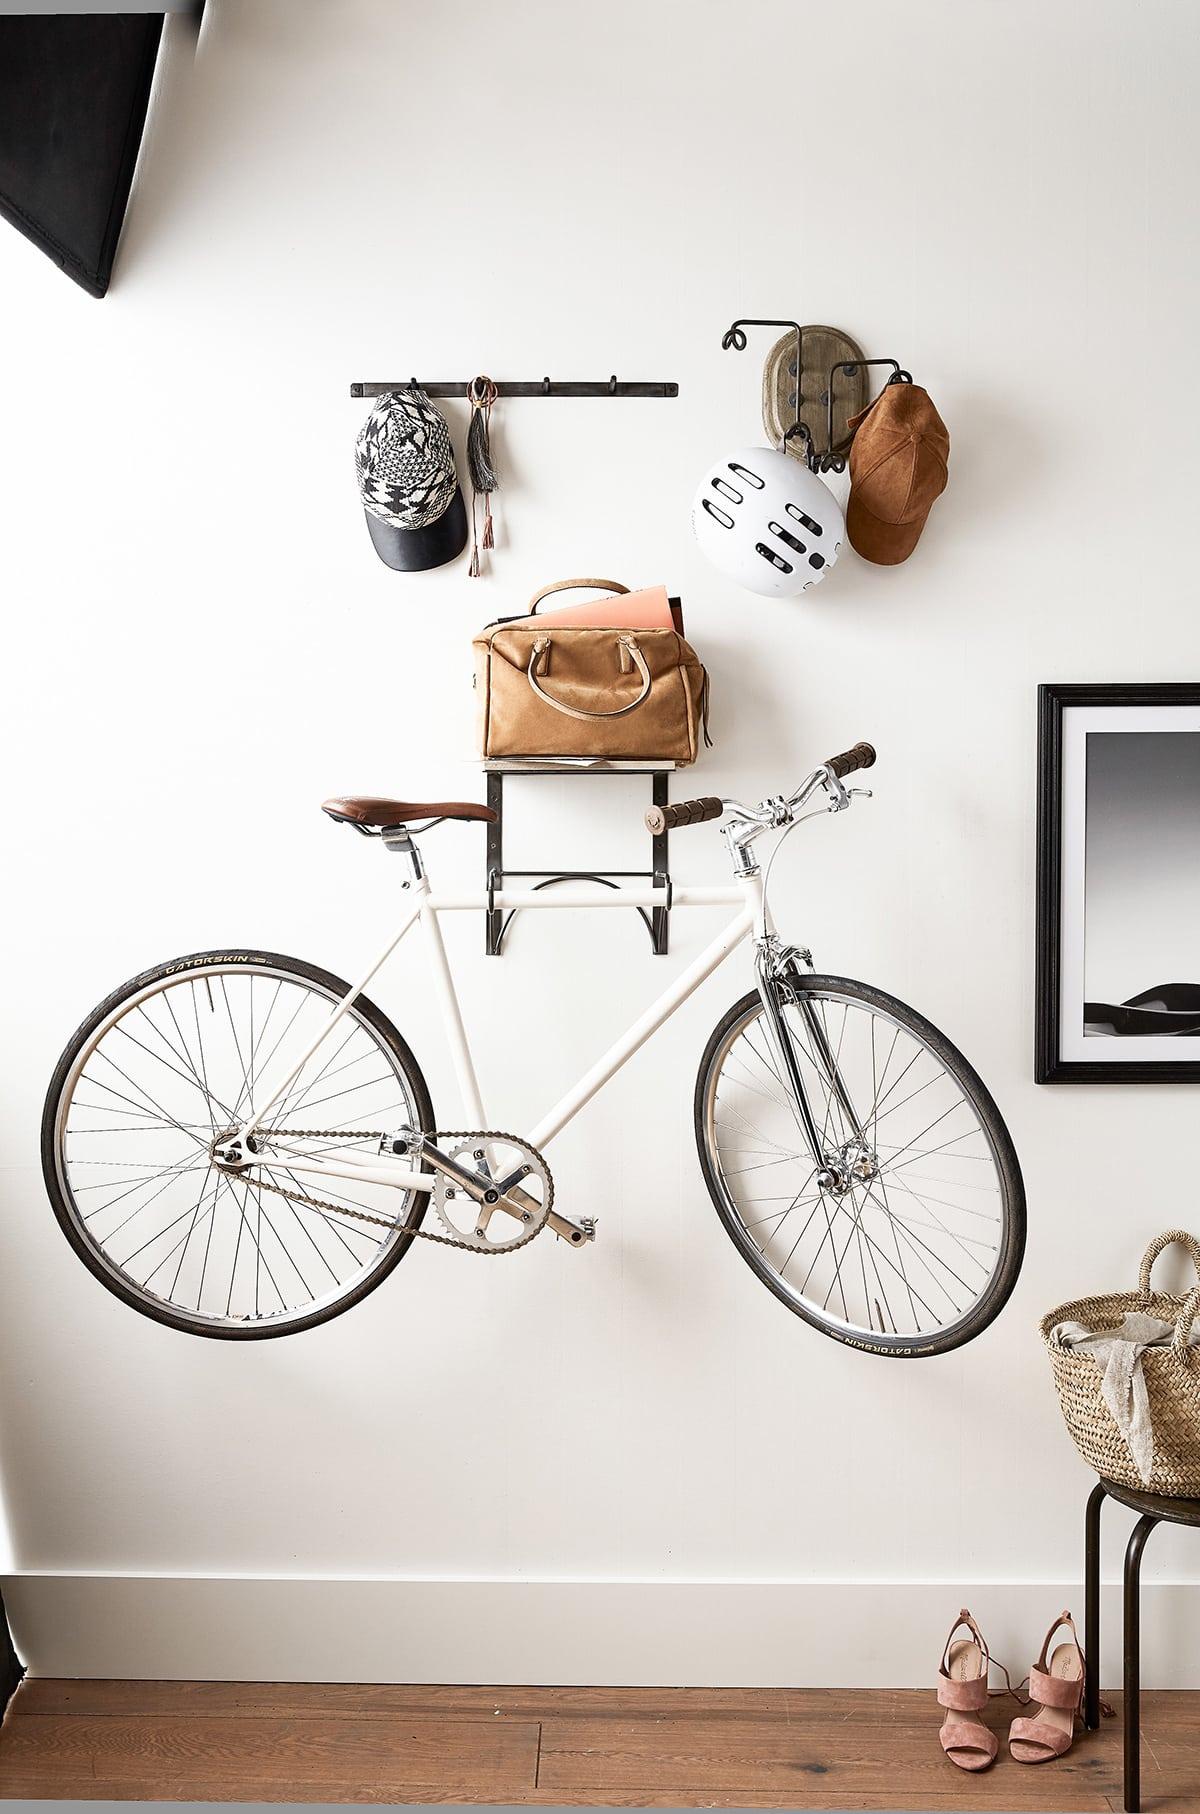 wall mounted bike rack inside front door with helmets and bag